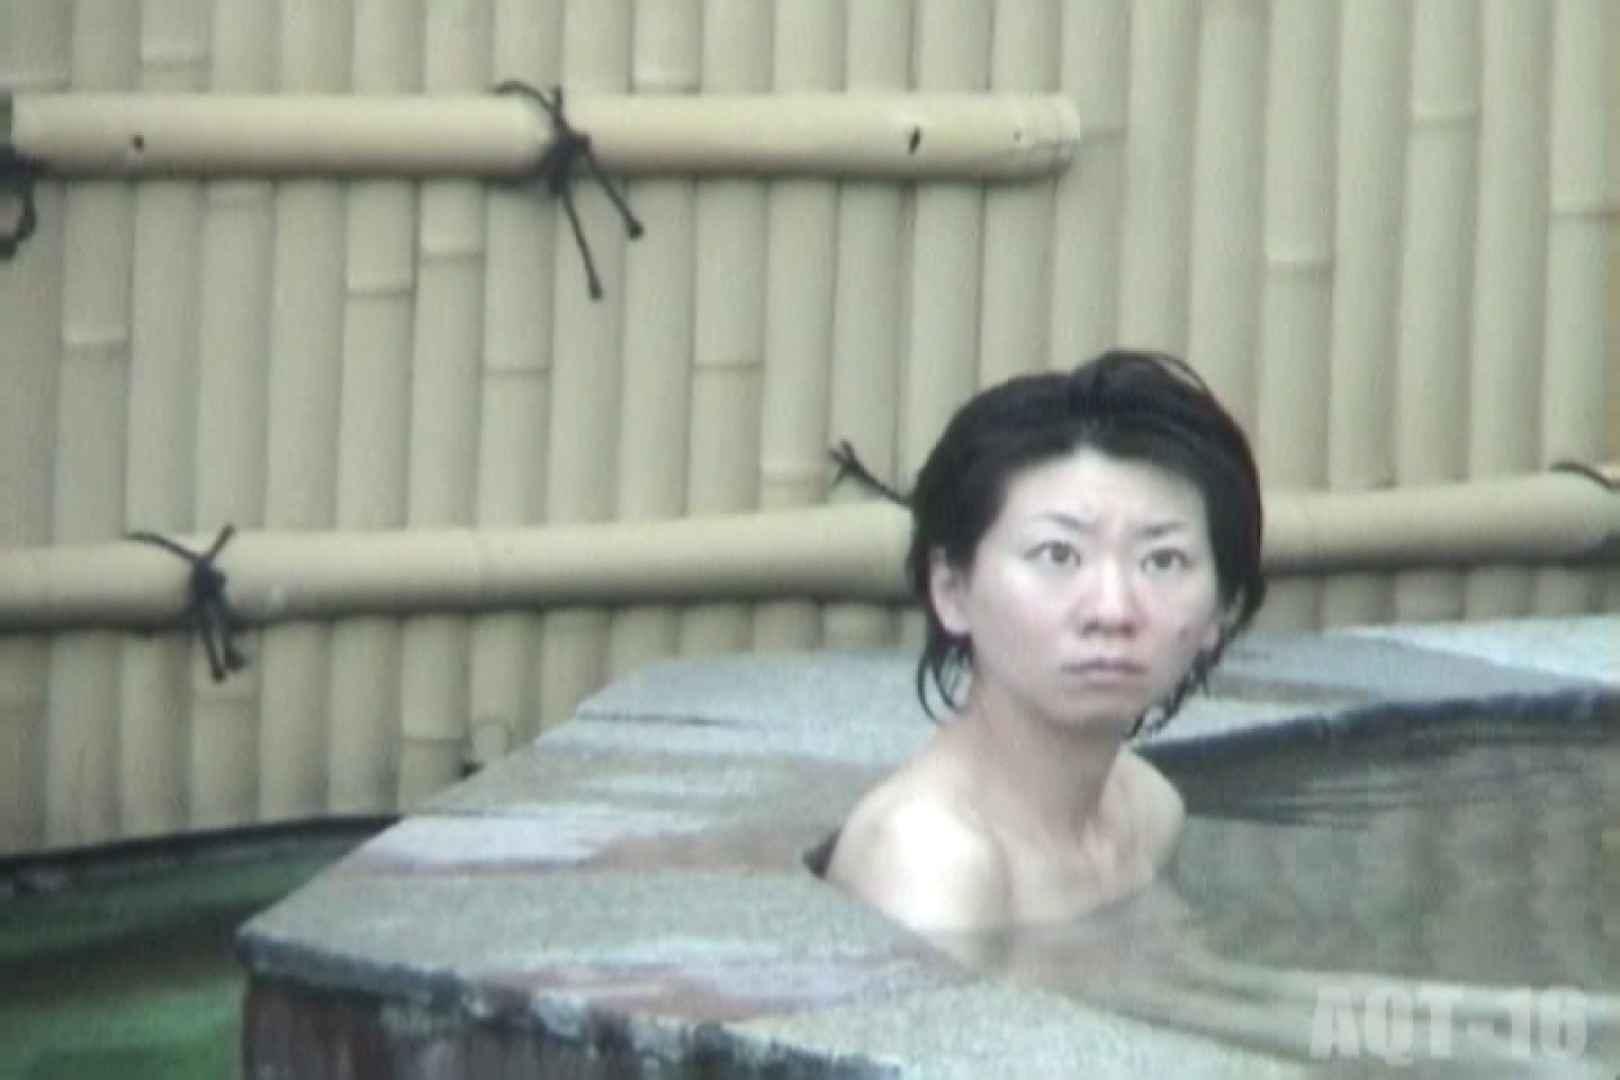 Aquaな露天風呂Vol.842 盗撮  44連発 18